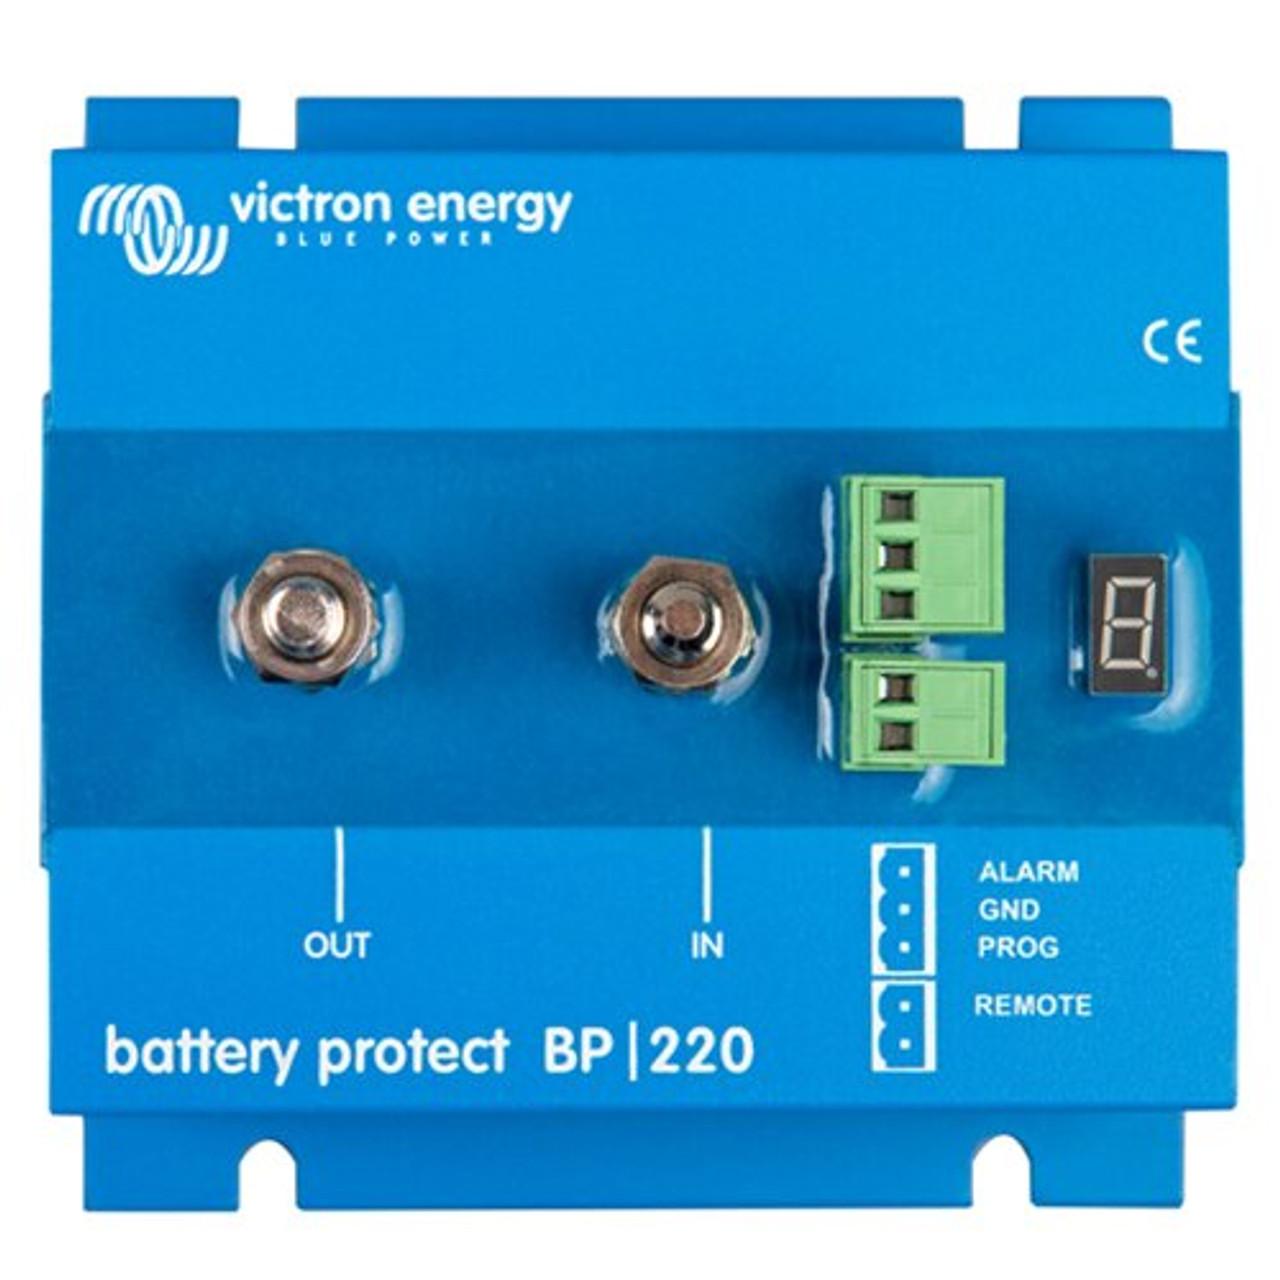 victron energy 220a Battery protect 12v//24v